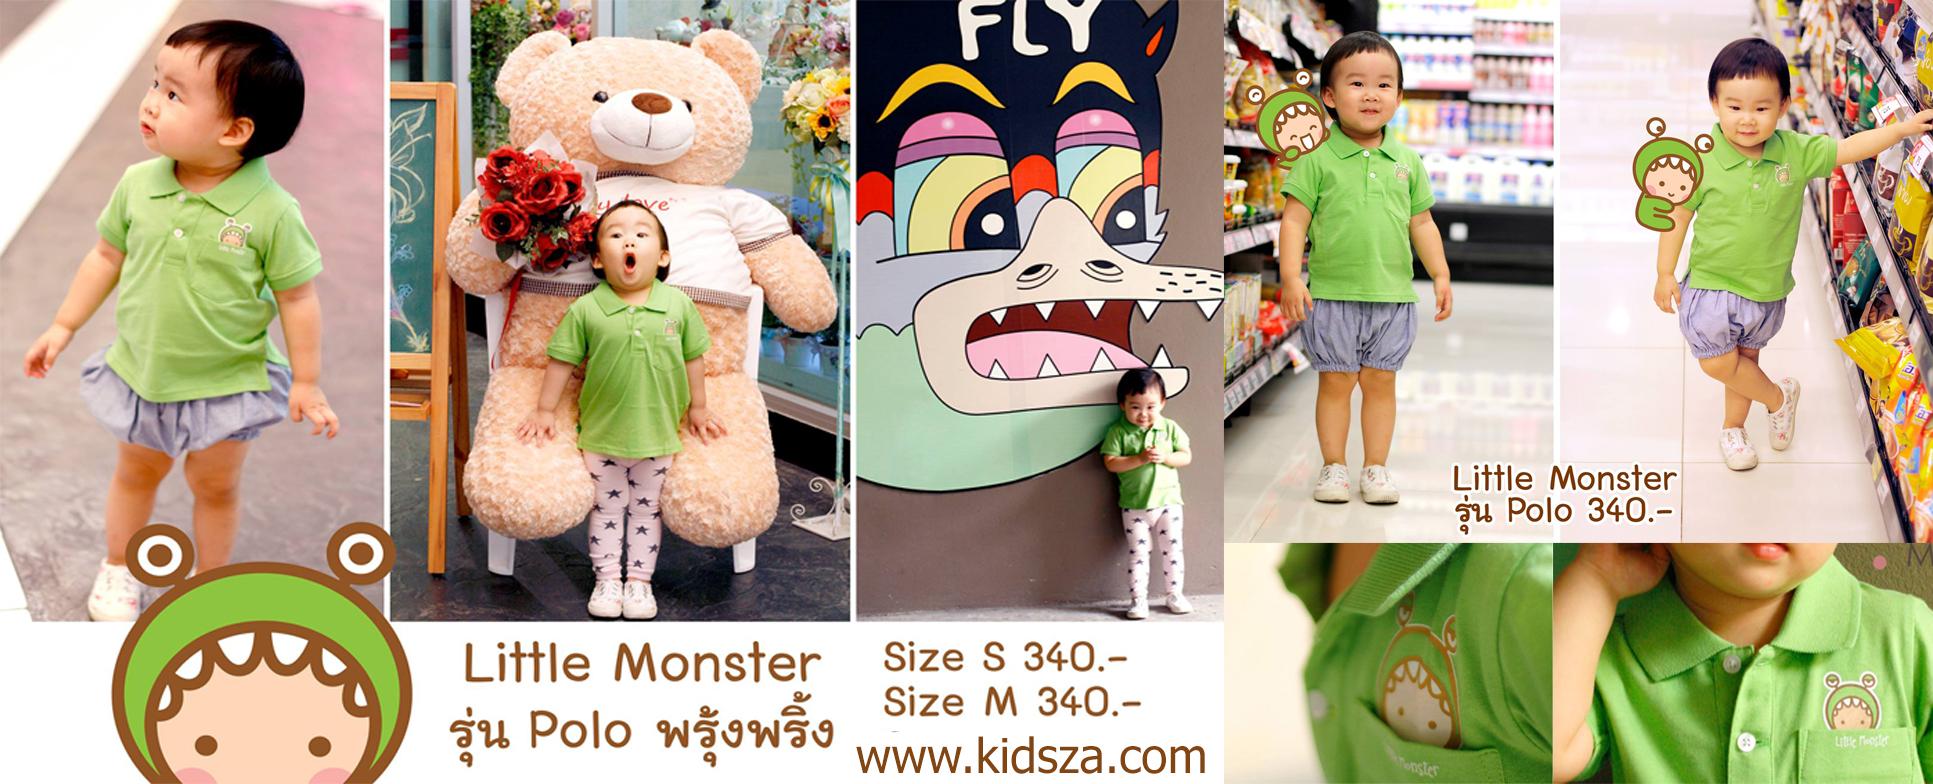 Little Monsterเสื้อโปโลแขนสั้น